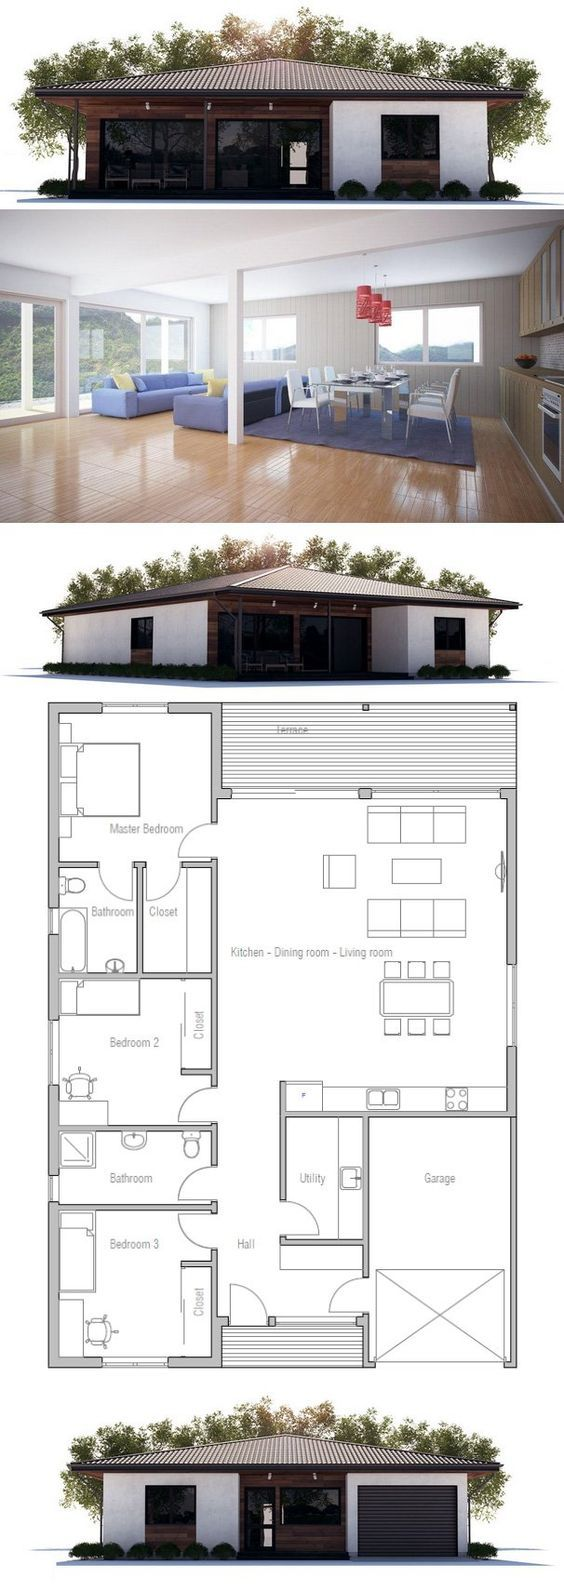 Small House Floor Plan: